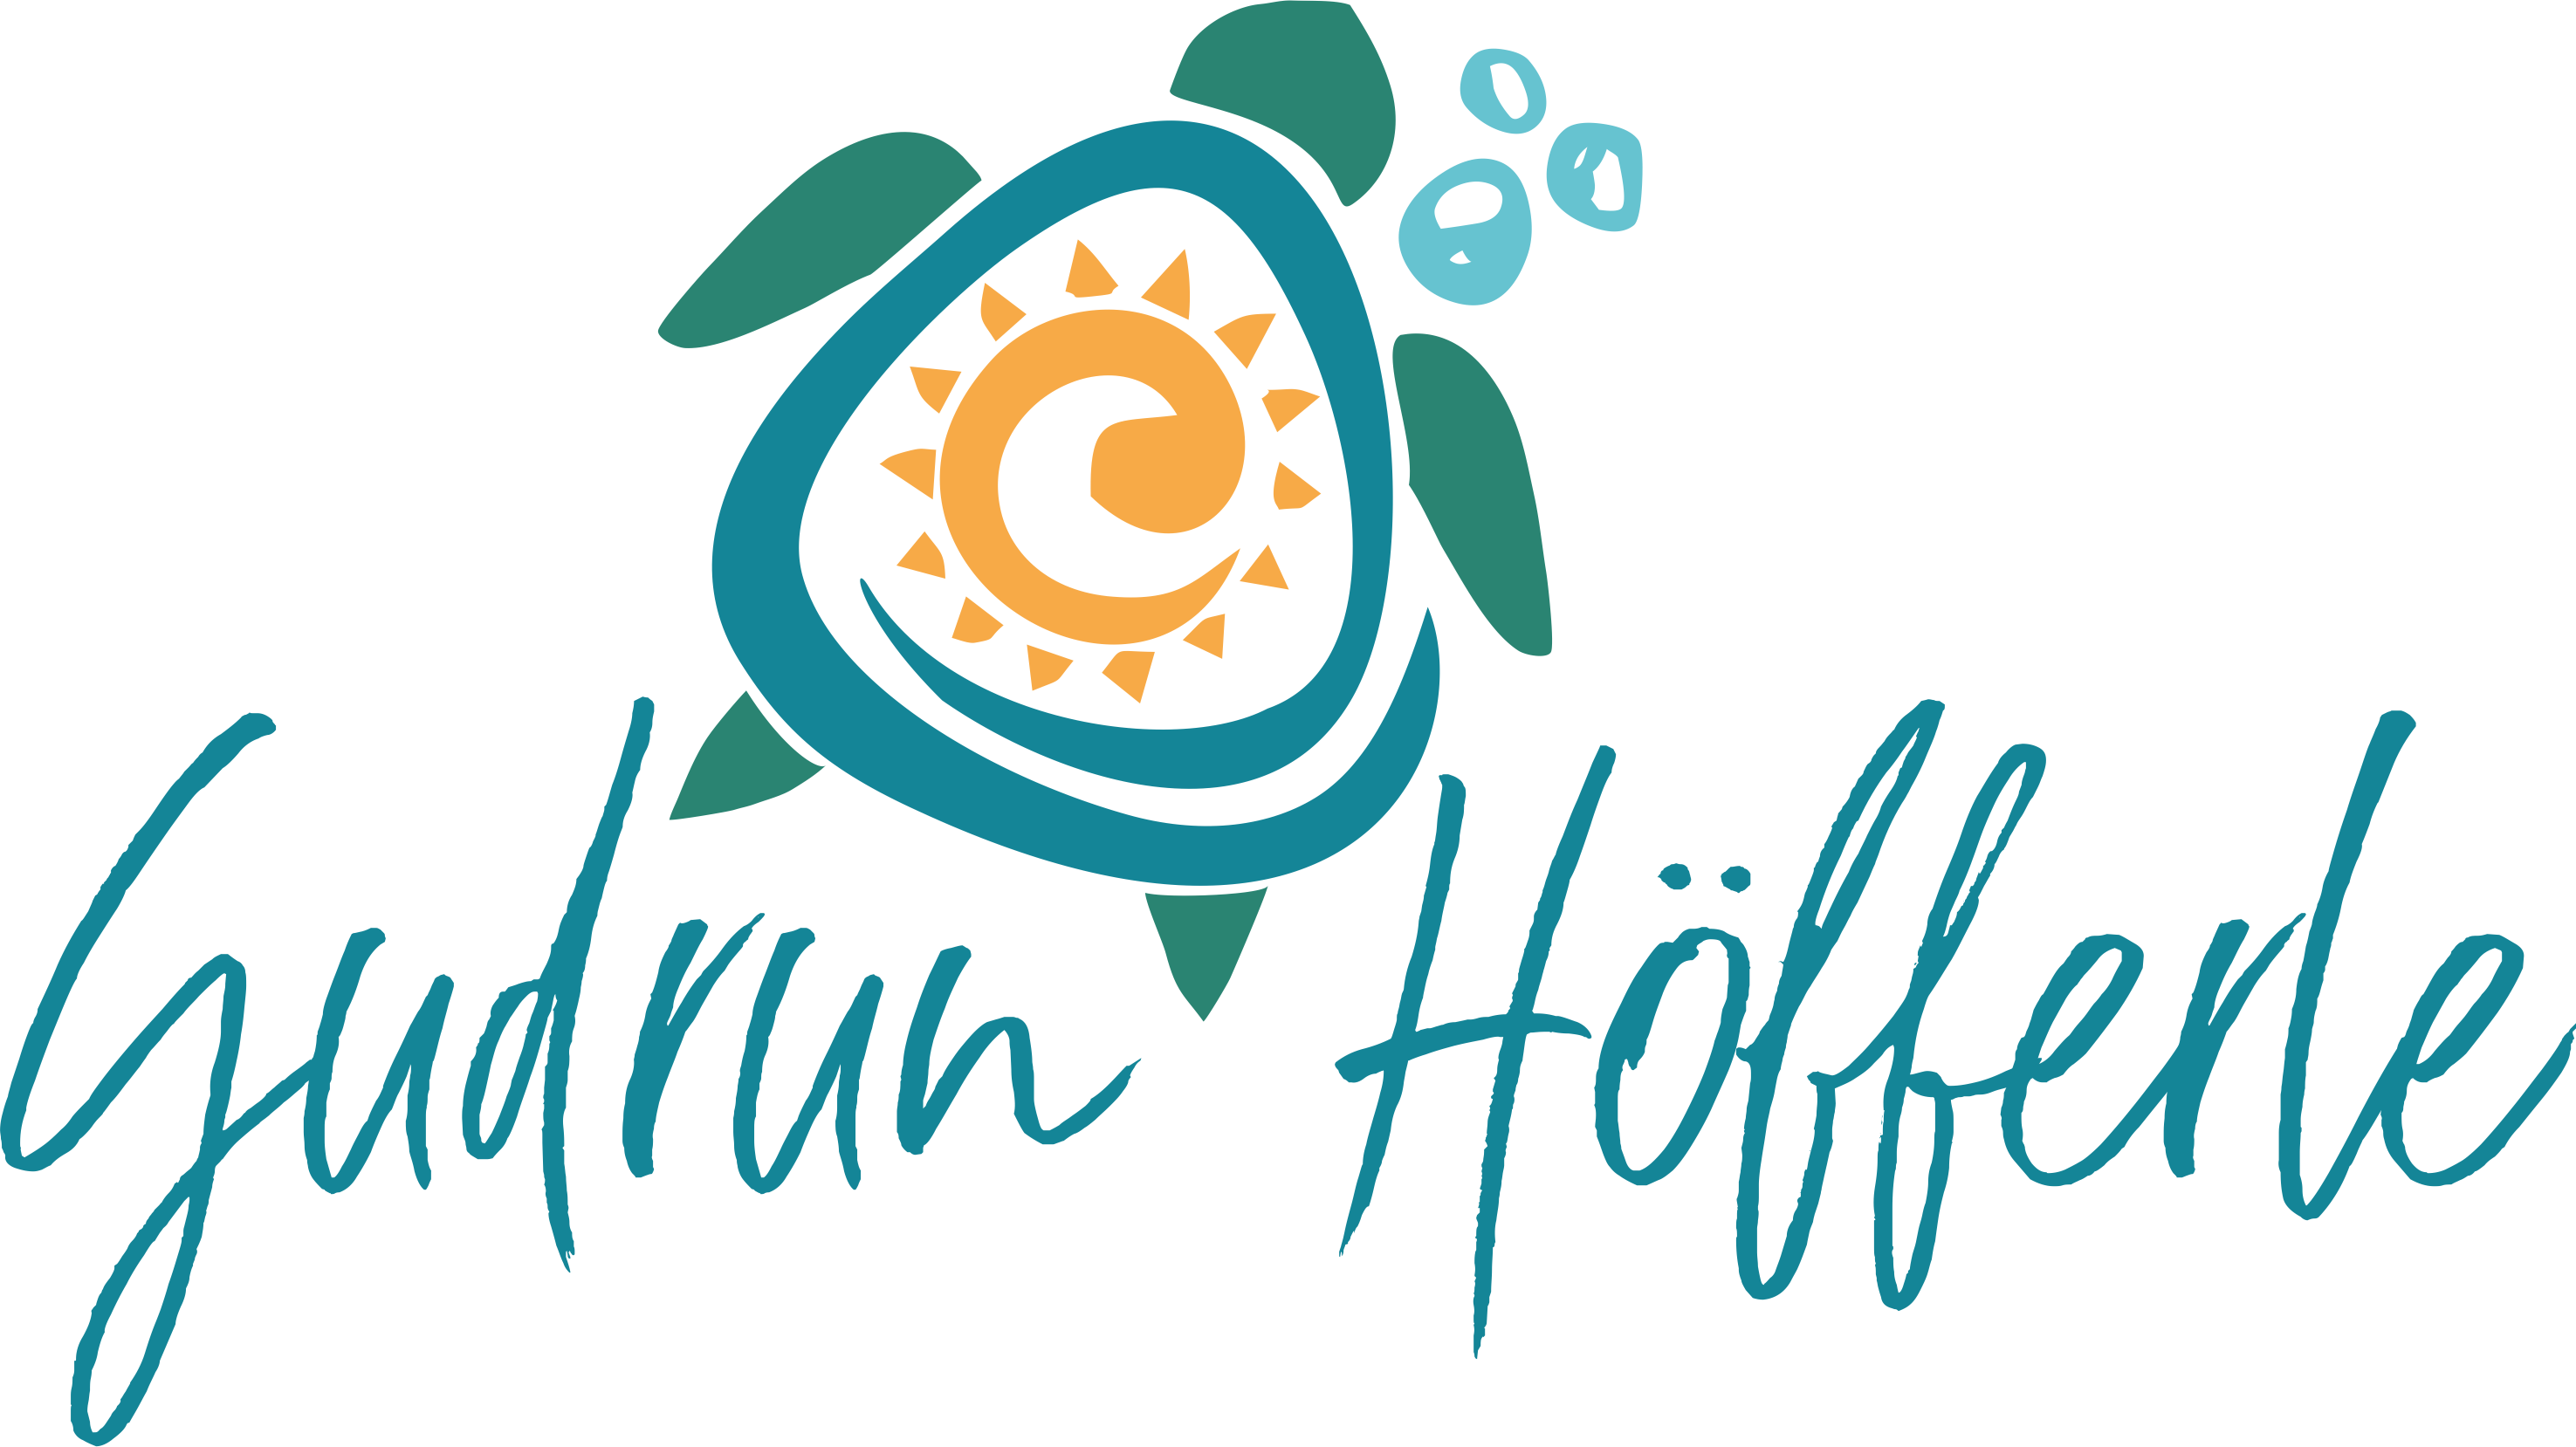 Gudrun Höfferle